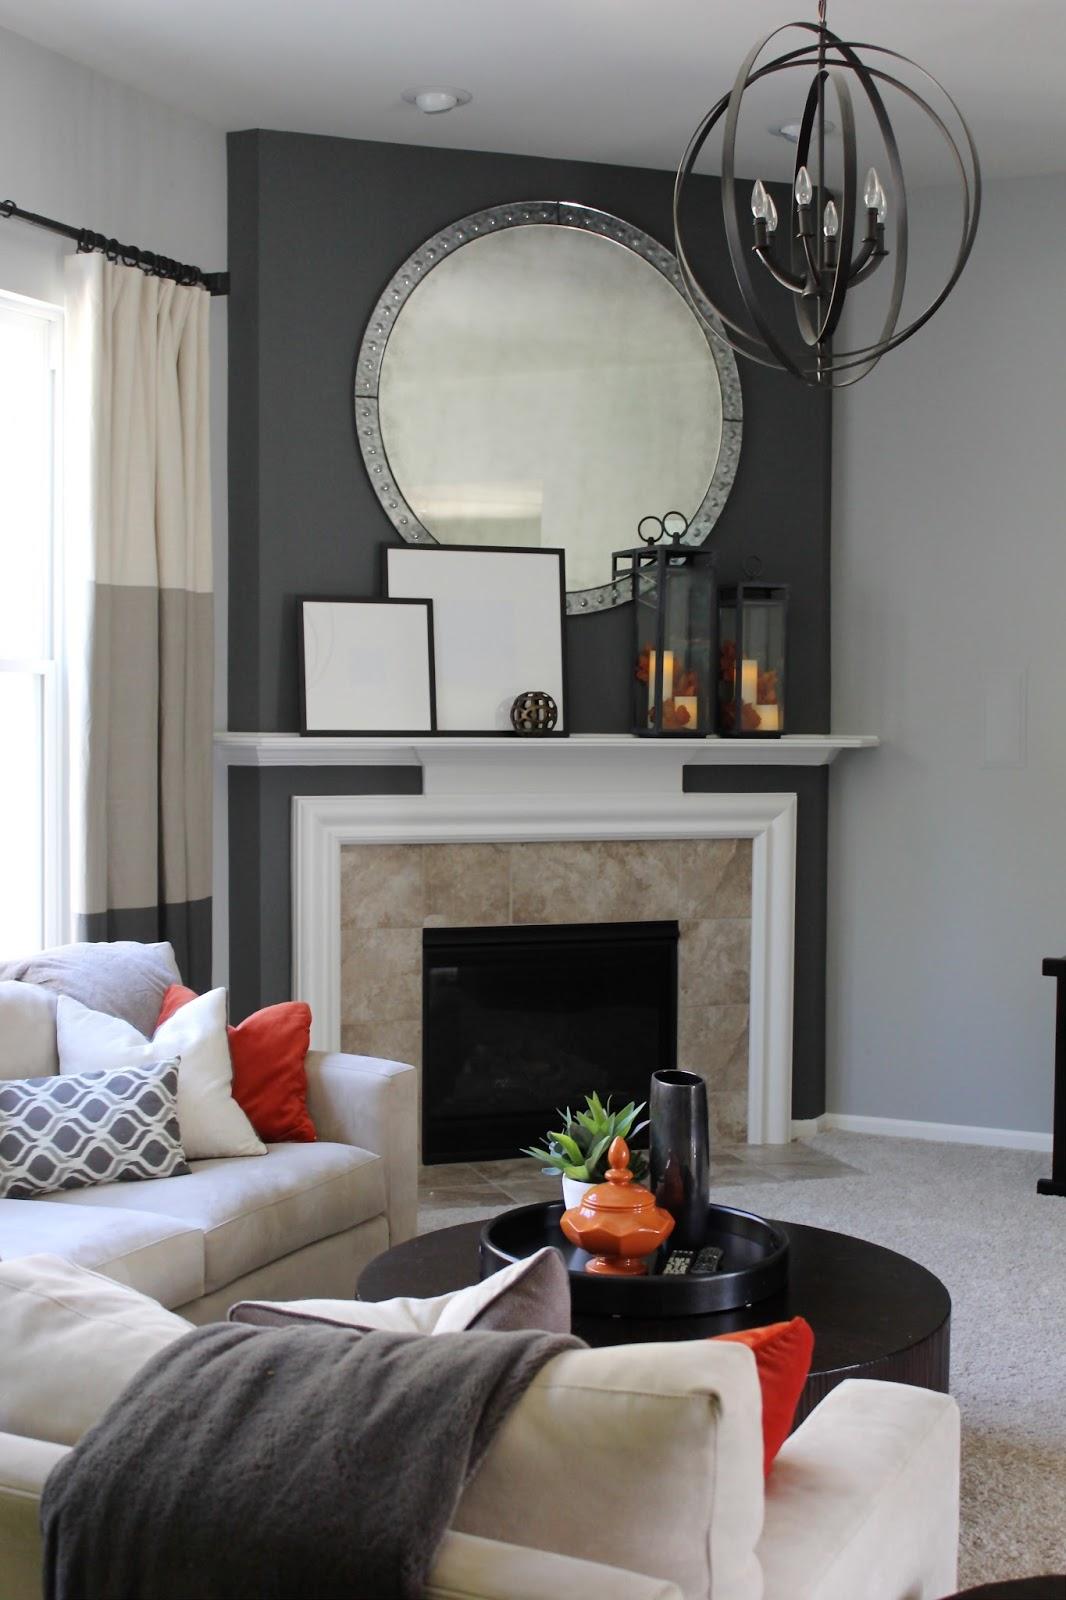 Room Design Program: The Yellow Cape Cod: Reveal-Living Room Design Plan Comes